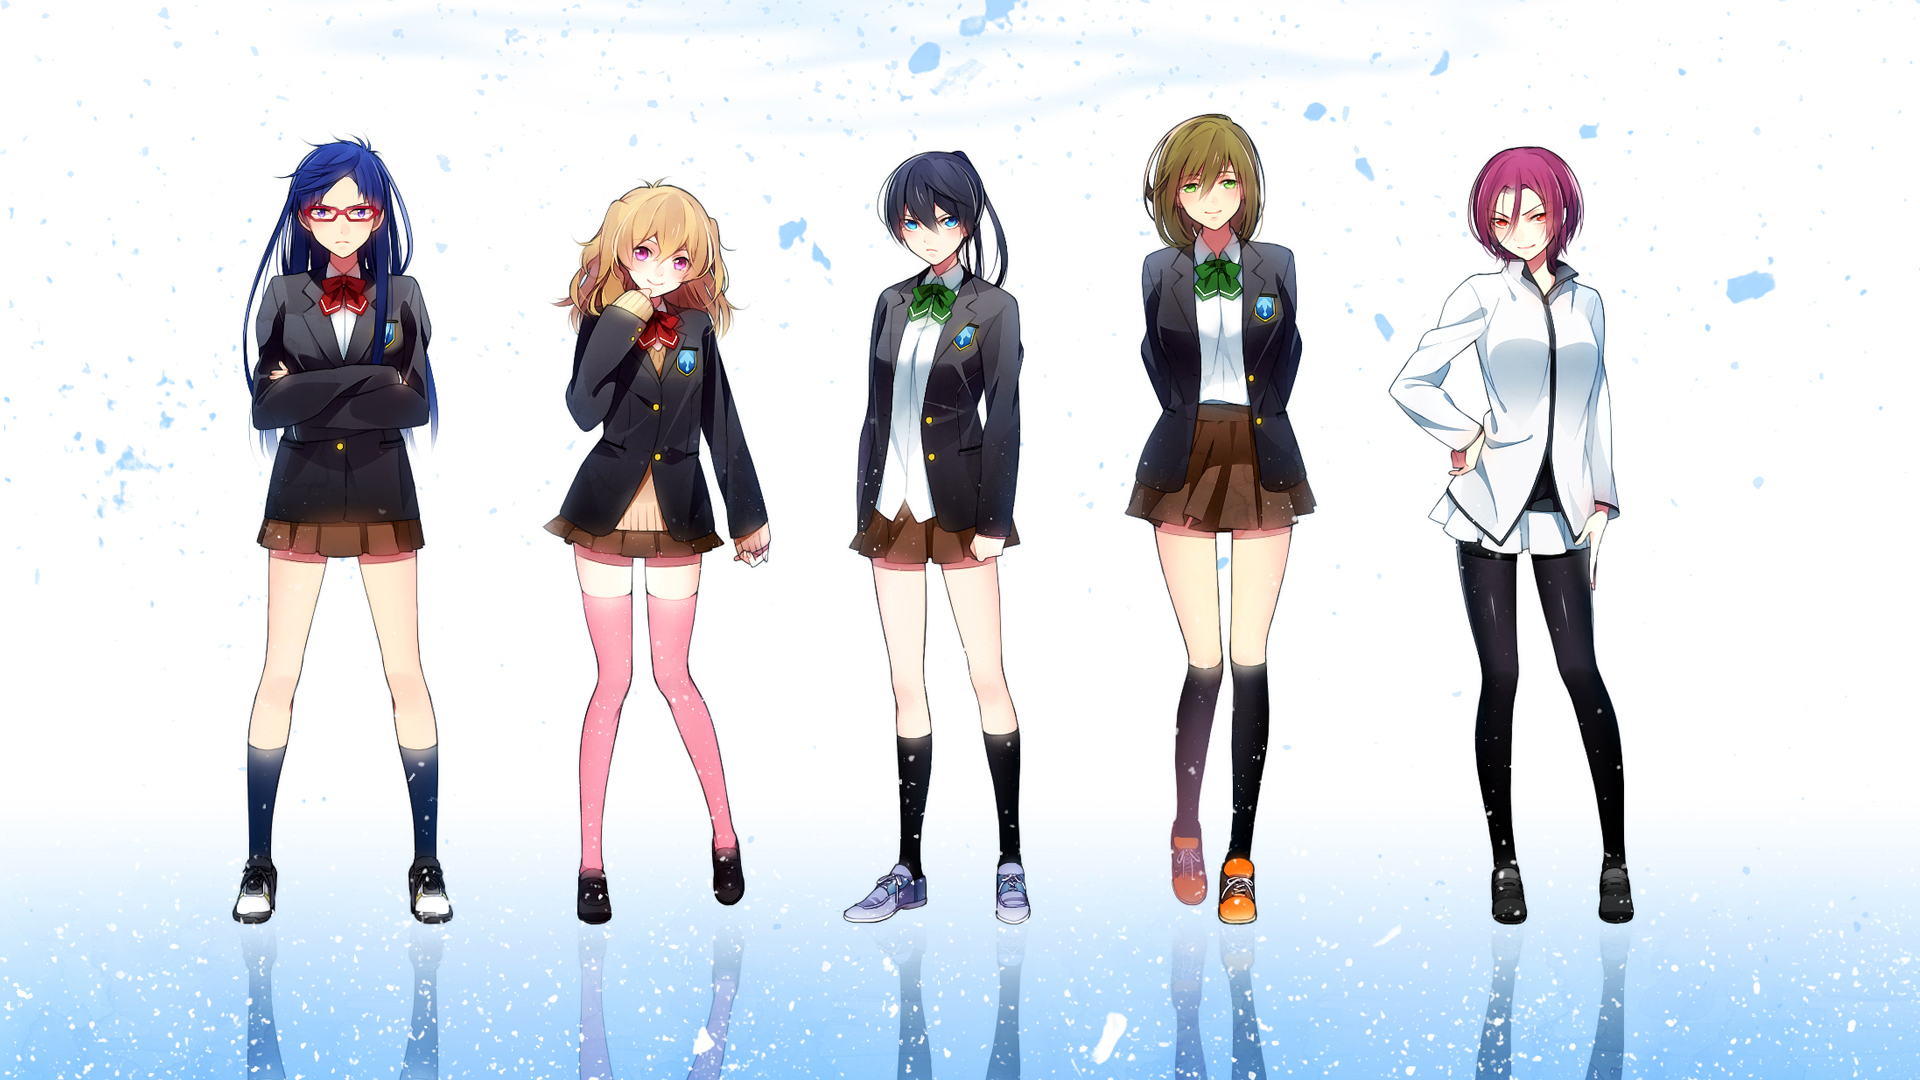 Free anime gender bender wallpaper hd free anime girl version voltagebd Choice Image